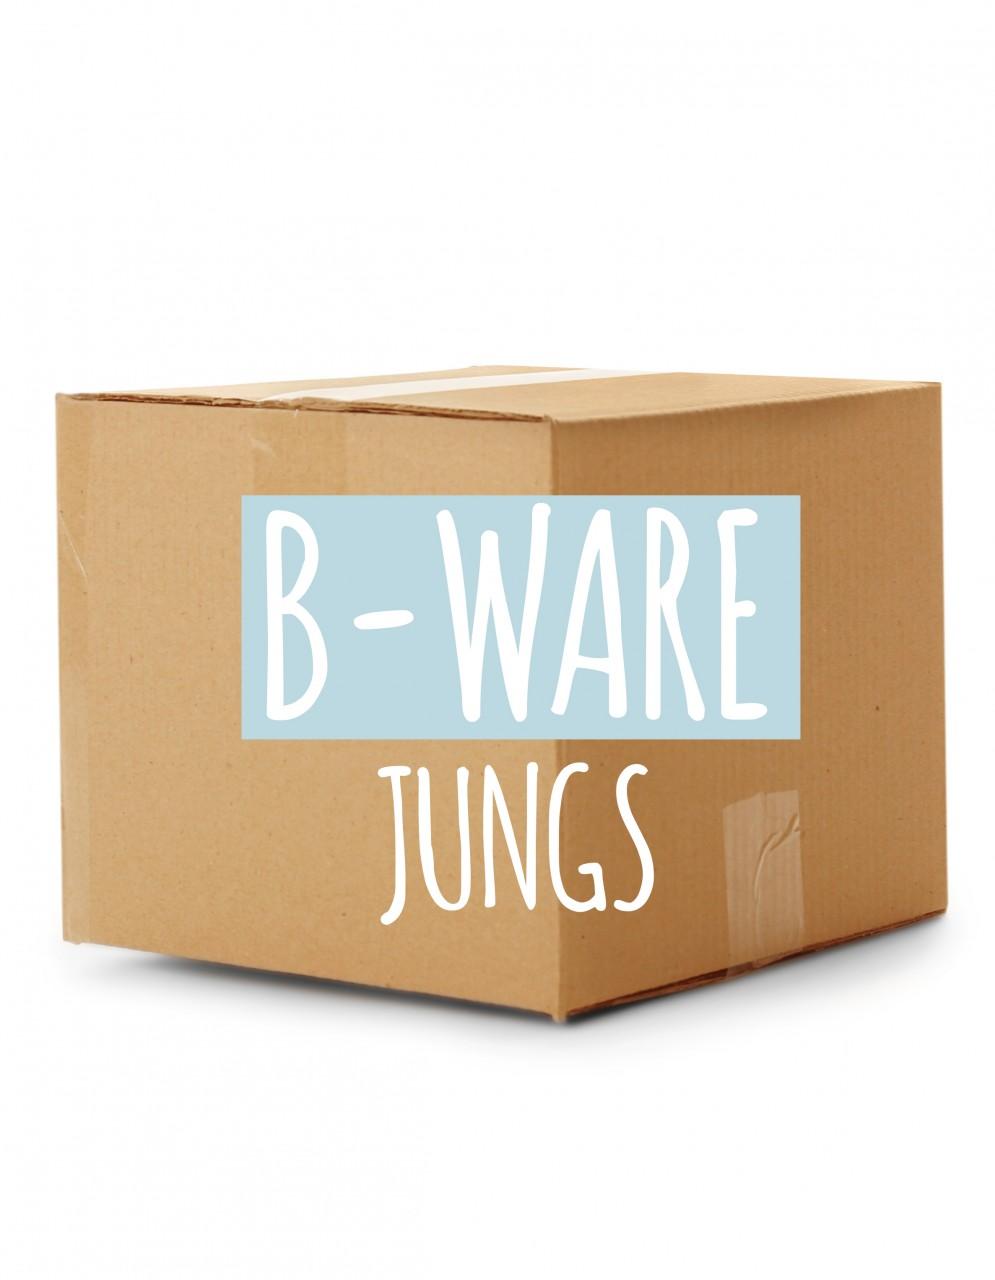 B-Ware Paket ca. 2,5 Meter JUNGS